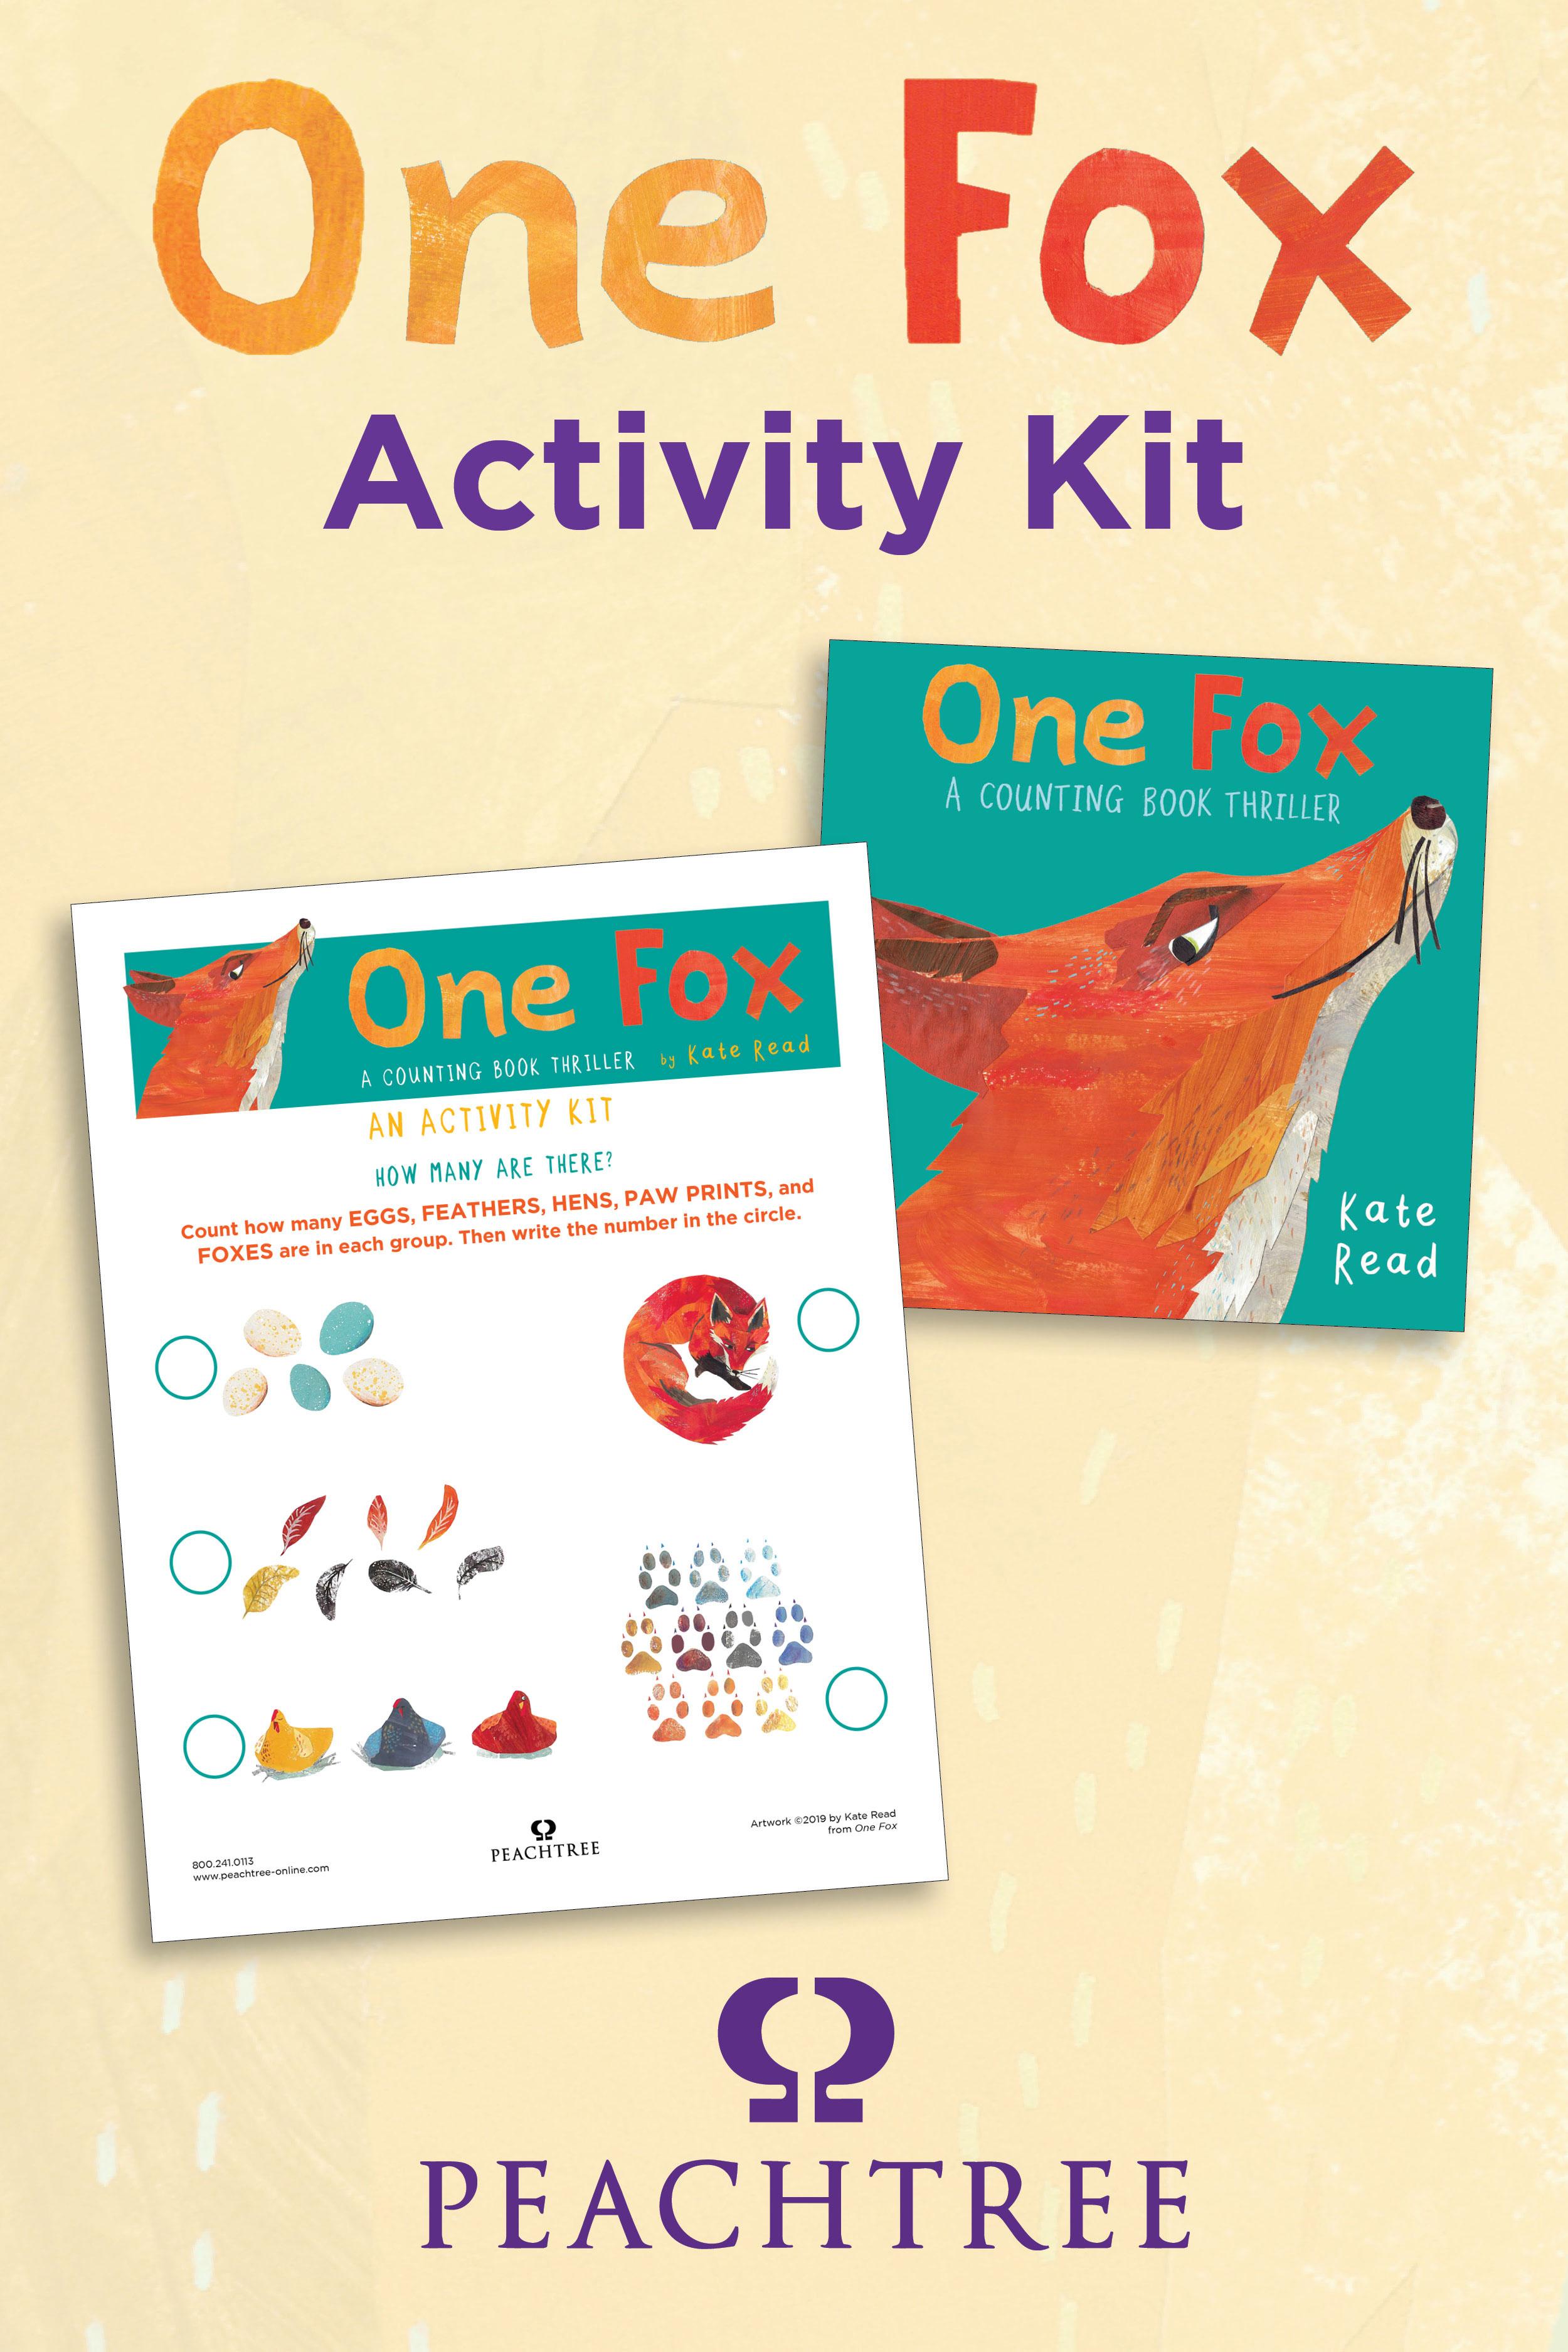 One Fox Activity Kit